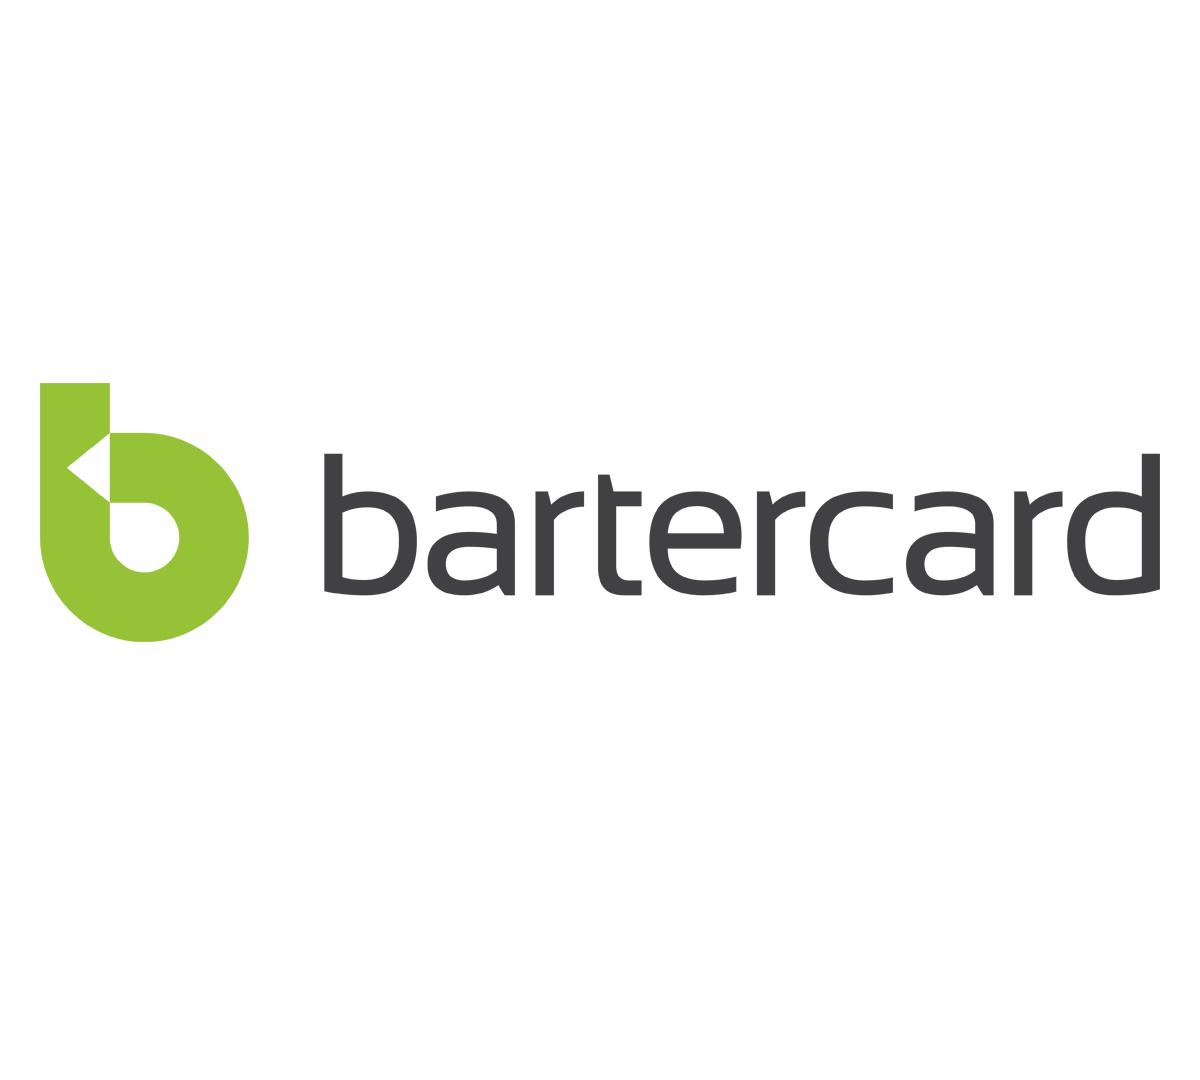 Bartercard.png